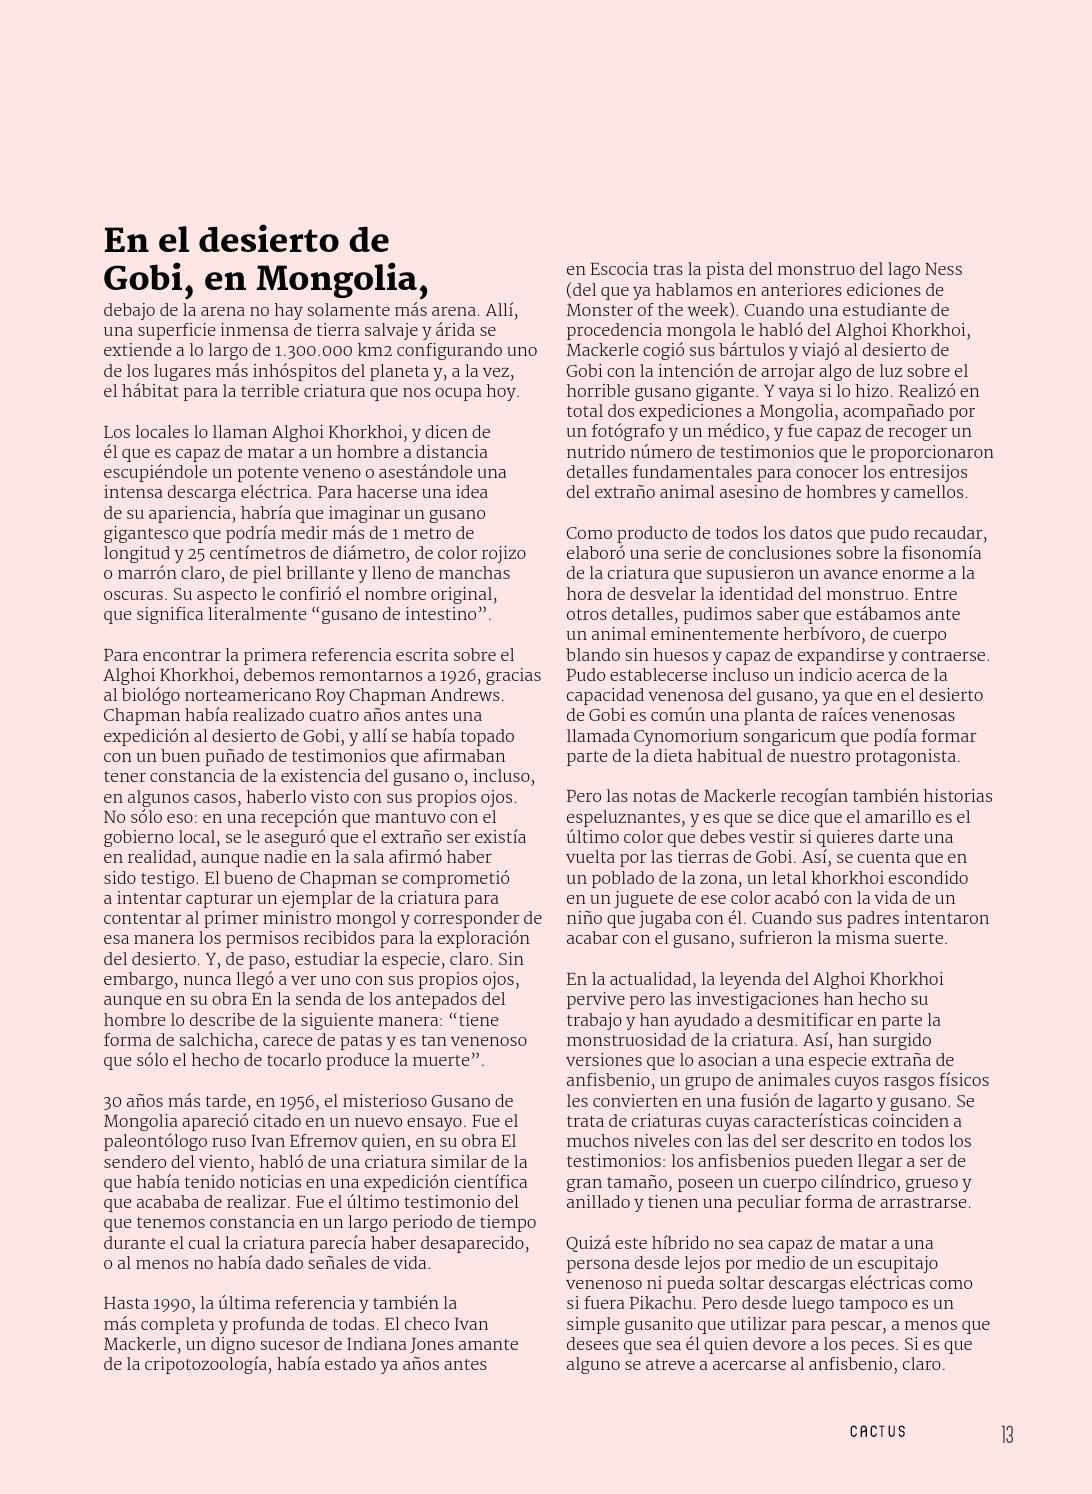 a960be3cc2 Cactus  8 by Cactus Revista - issuu